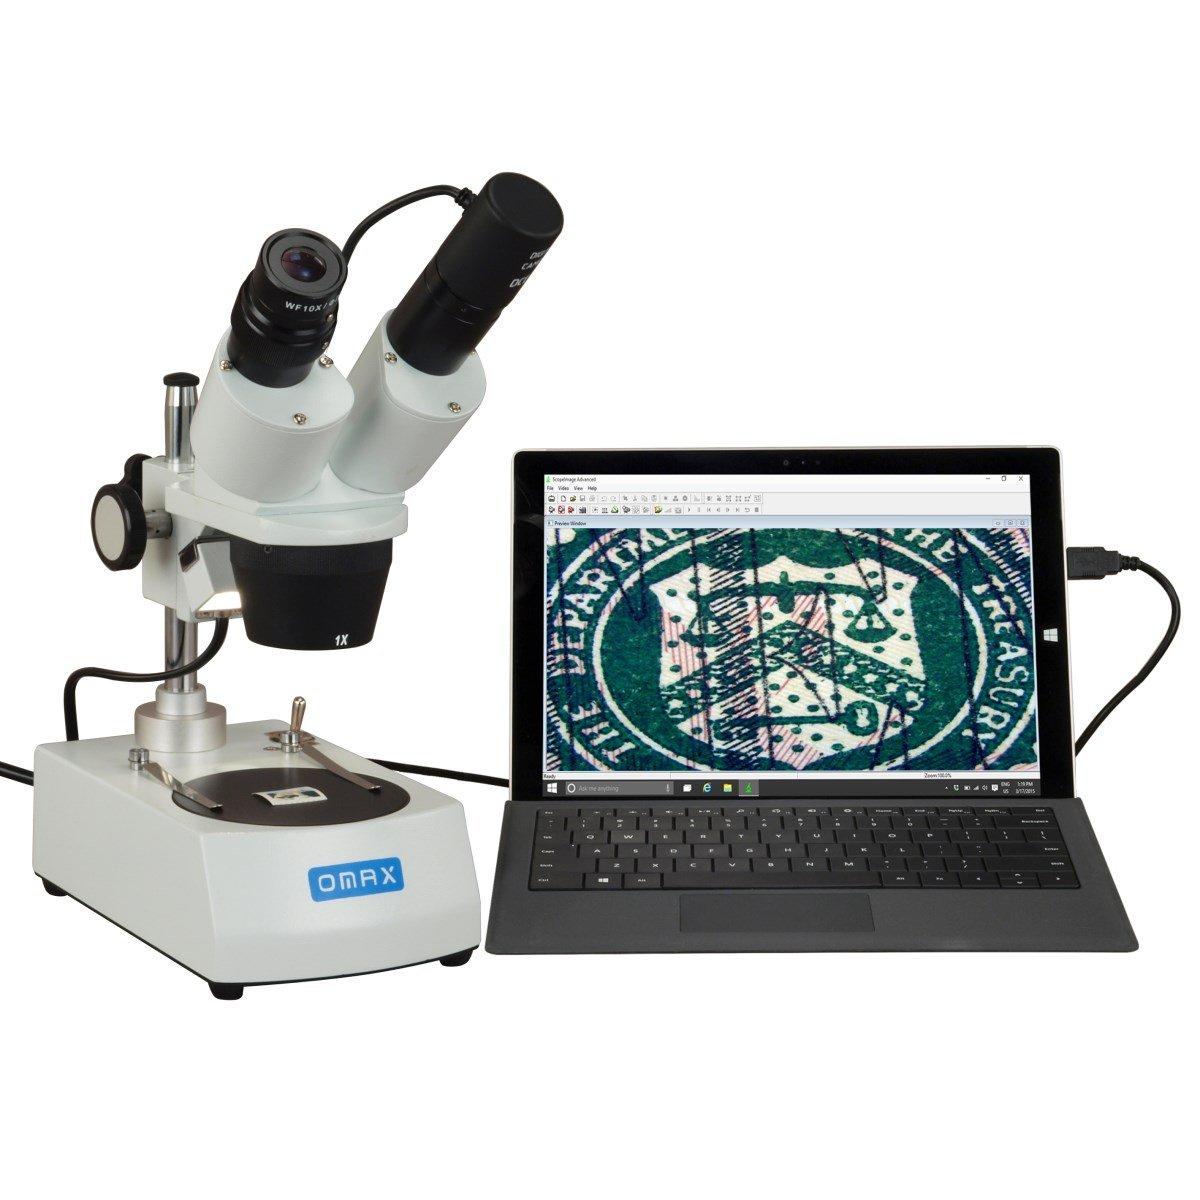 OMAX 10X-20X-30X-60X Binocular Student Stereo Microscope with USB Camera